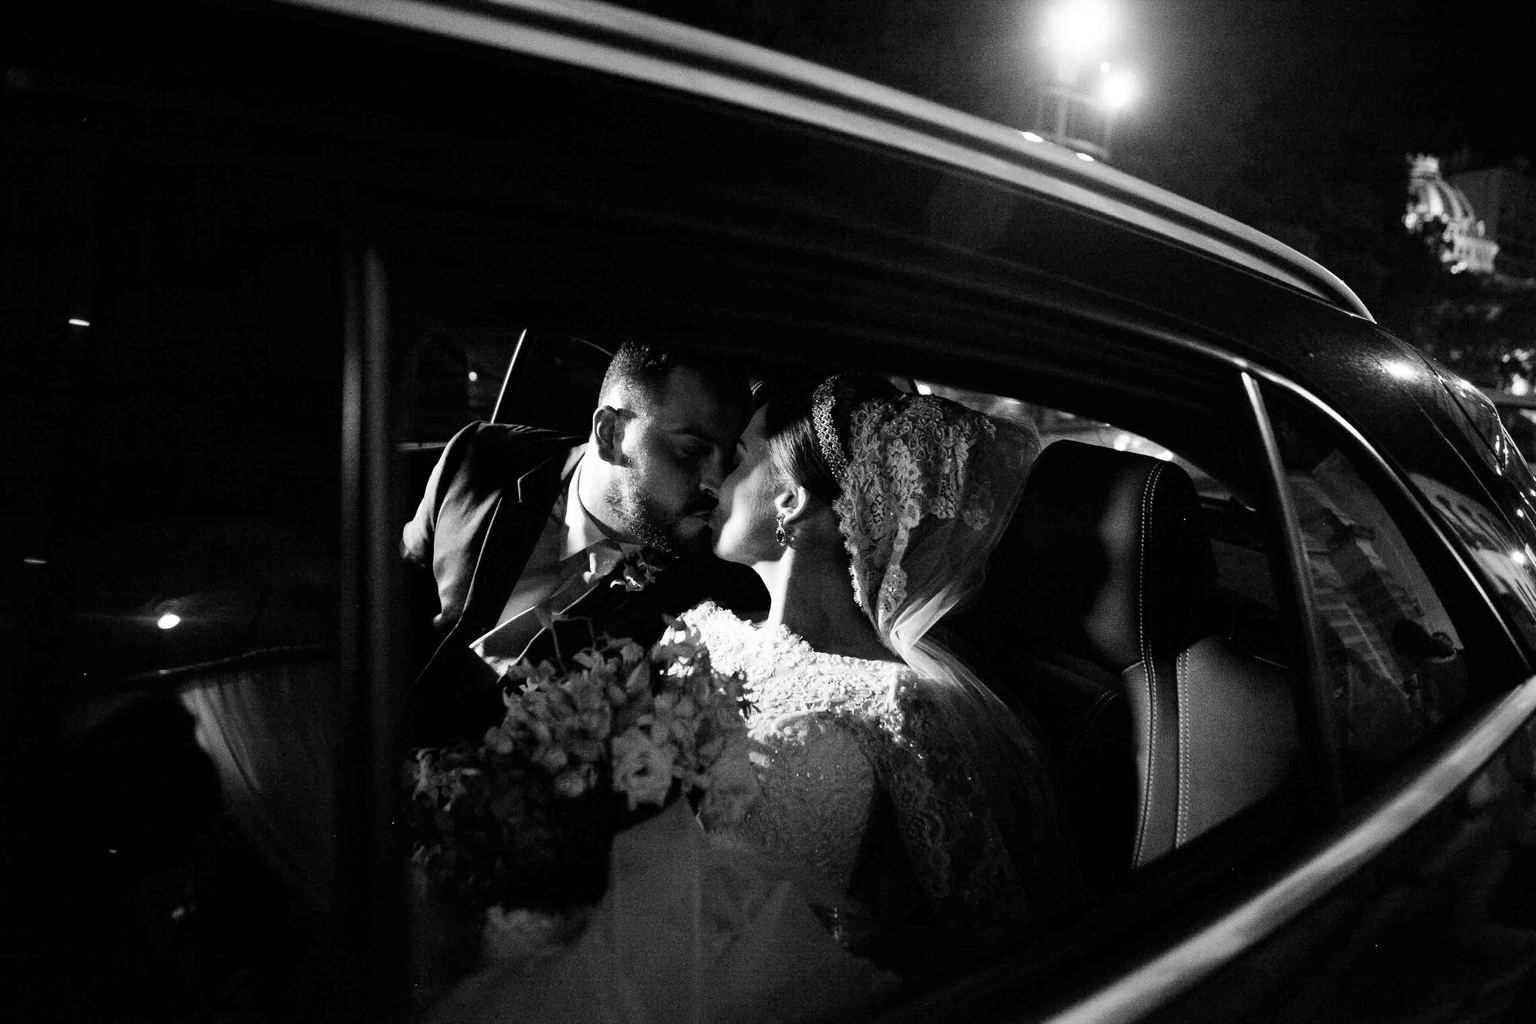 Carro-da-noiva-Casamento-Clássico-Casamento-tradicional-Copacabana-Palace-Monica-Roias-Ribas-Foto-e-Vídeo-Tuanny-e-Bernardo-CaseMe-2